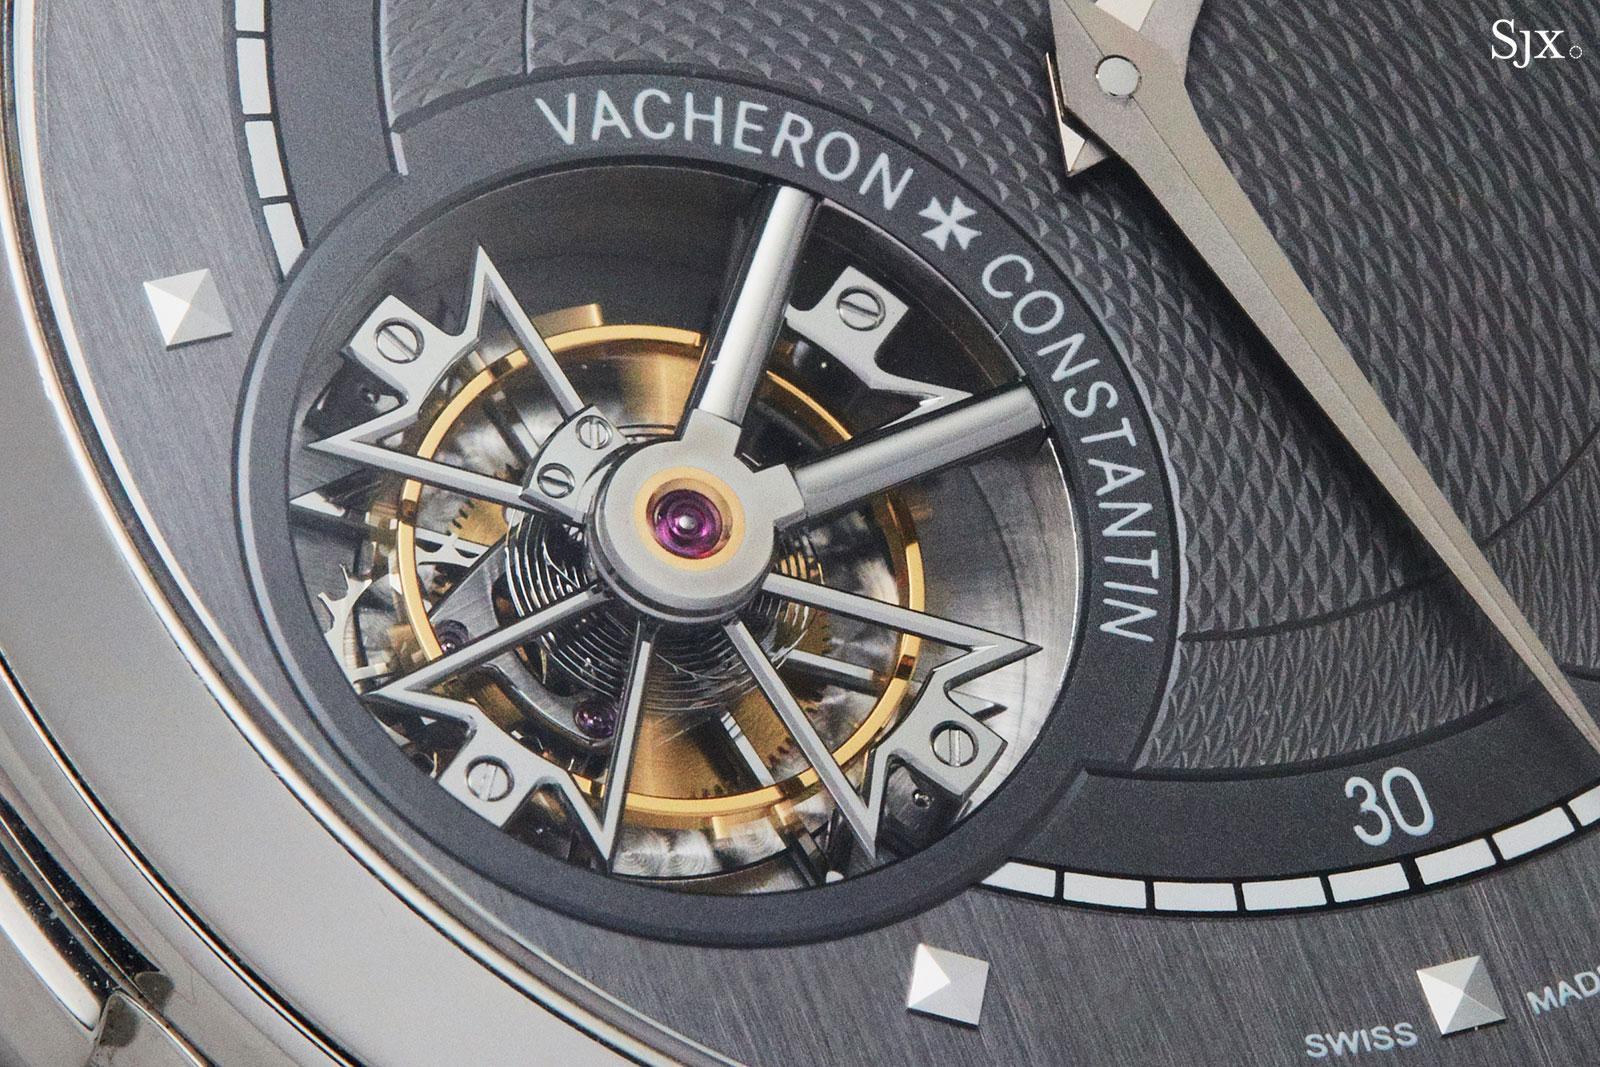 Vacheron Constantin Cabinotiers grand complication 30016-000P 5